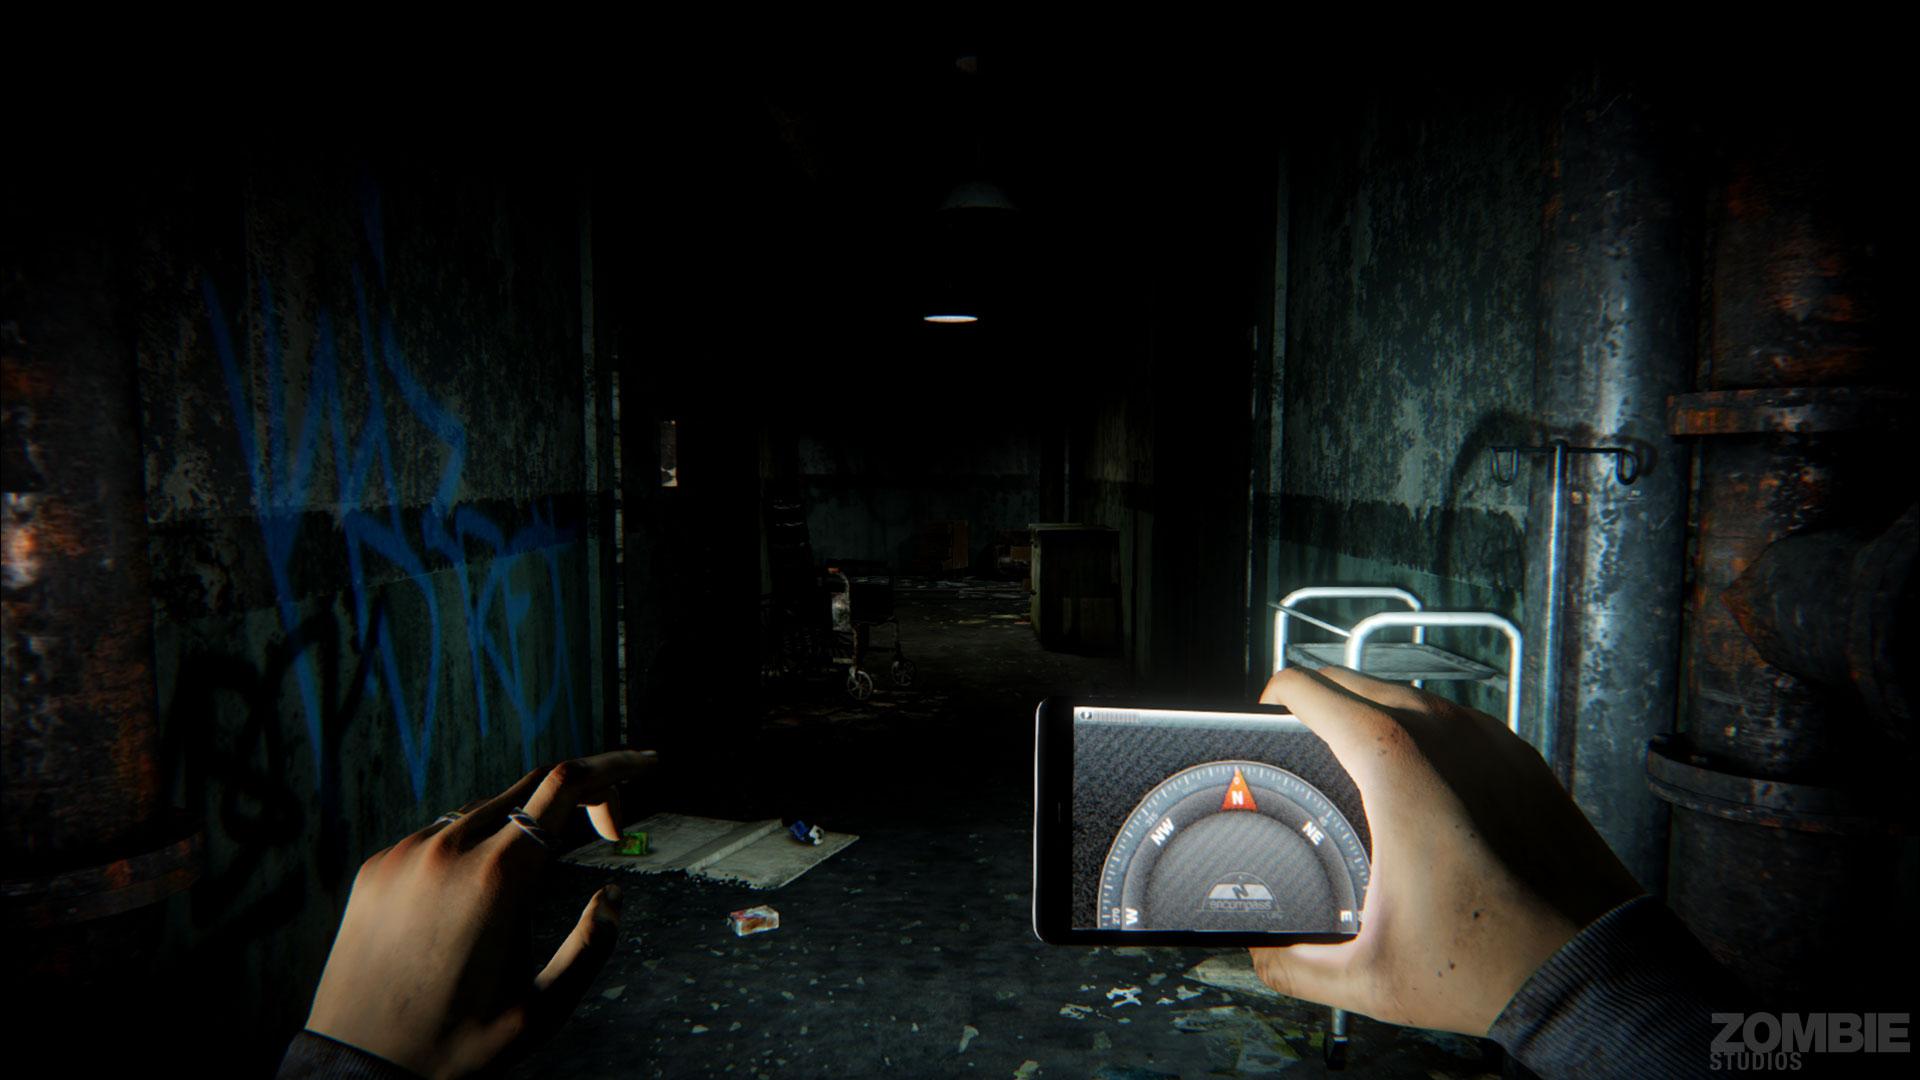 Steam game oculus rift virtual reality paradise gentleman039s club free play - 5 5